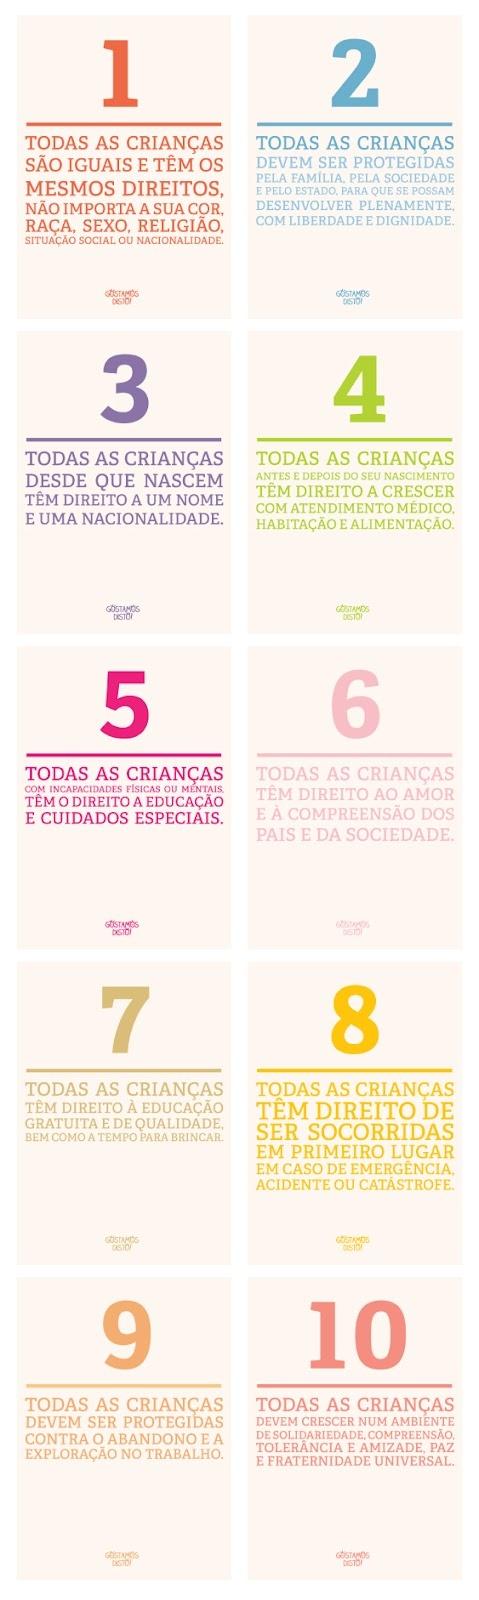 599 best escolas images by maria marta on pinterest learning direitos das crianas em portugus gostamos disto fandeluxe Gallery